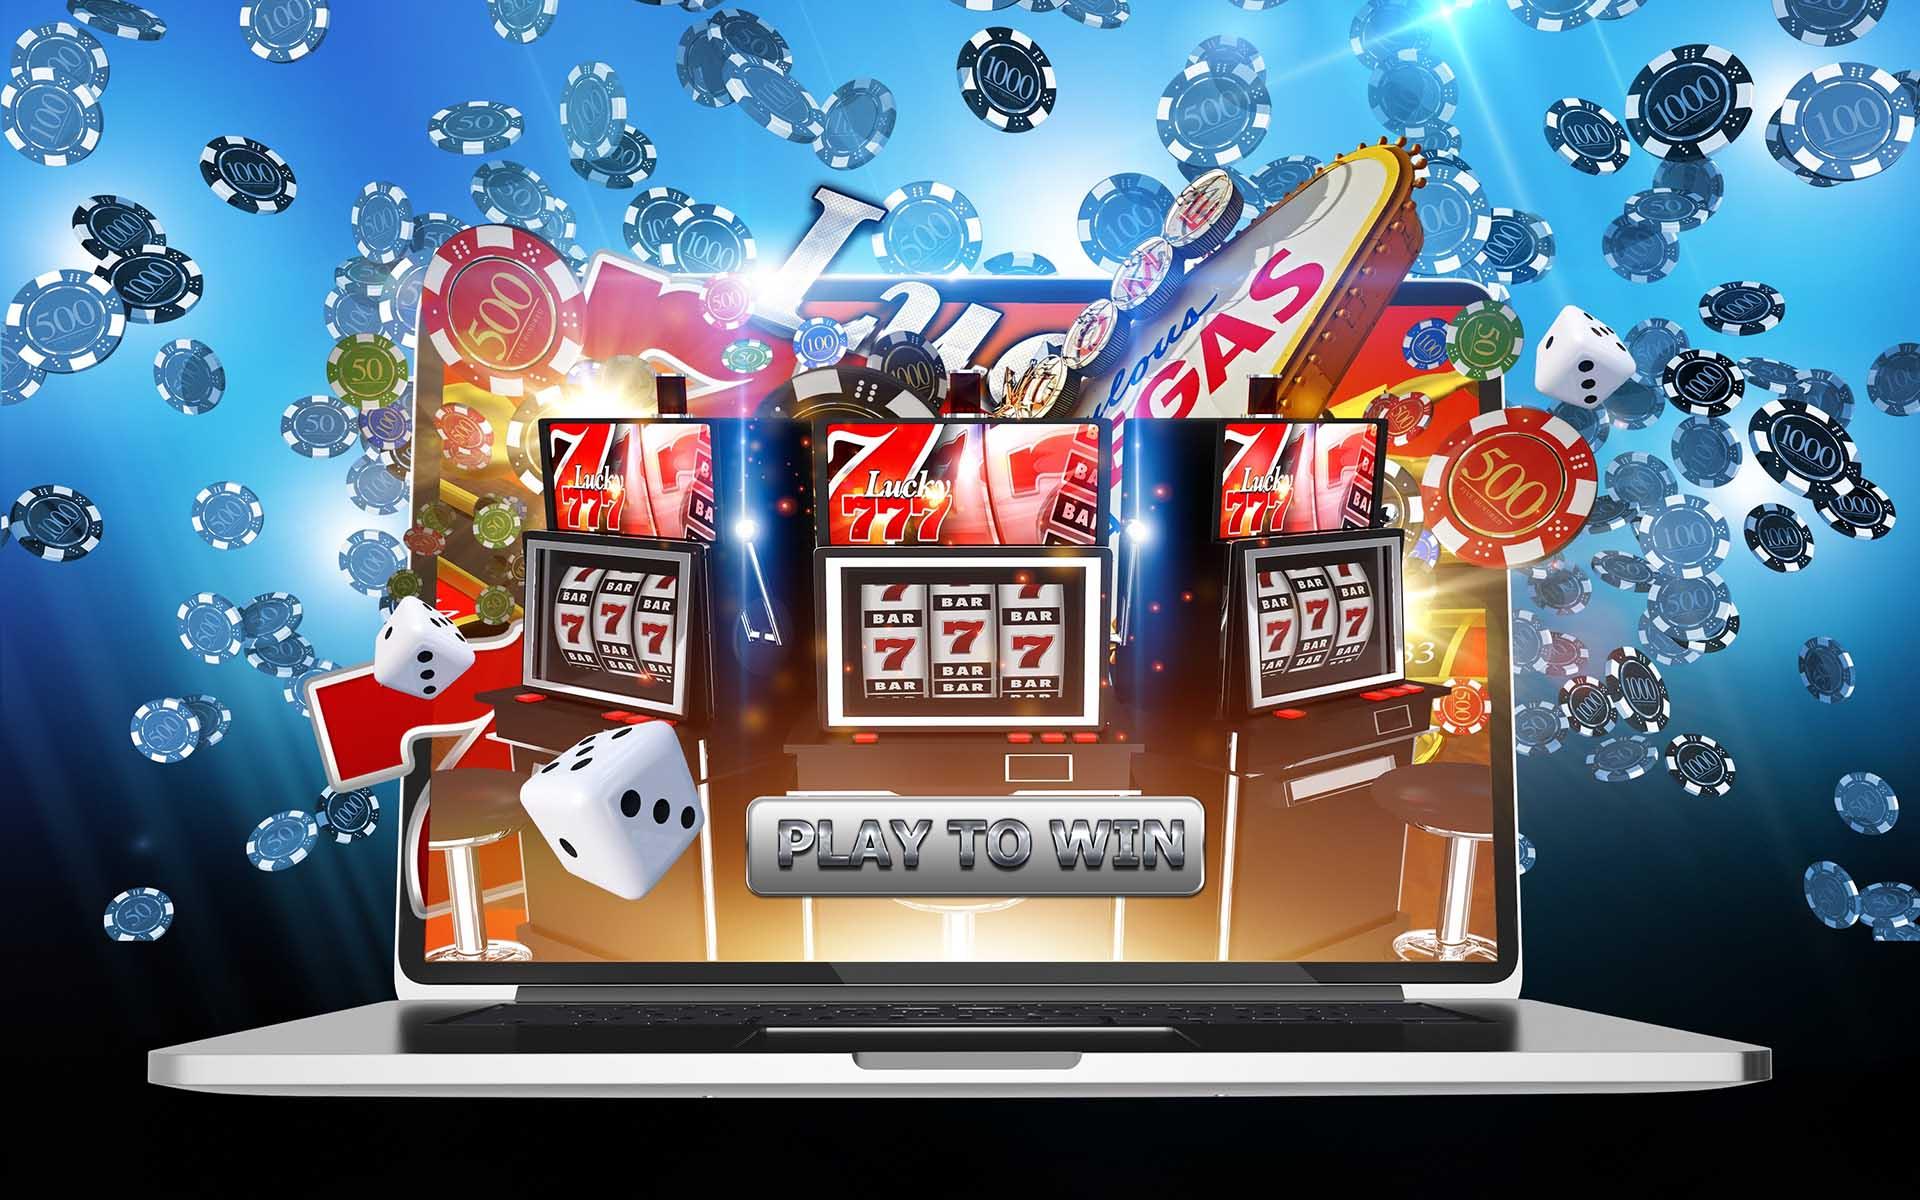 Mobile Bingo Pros Image